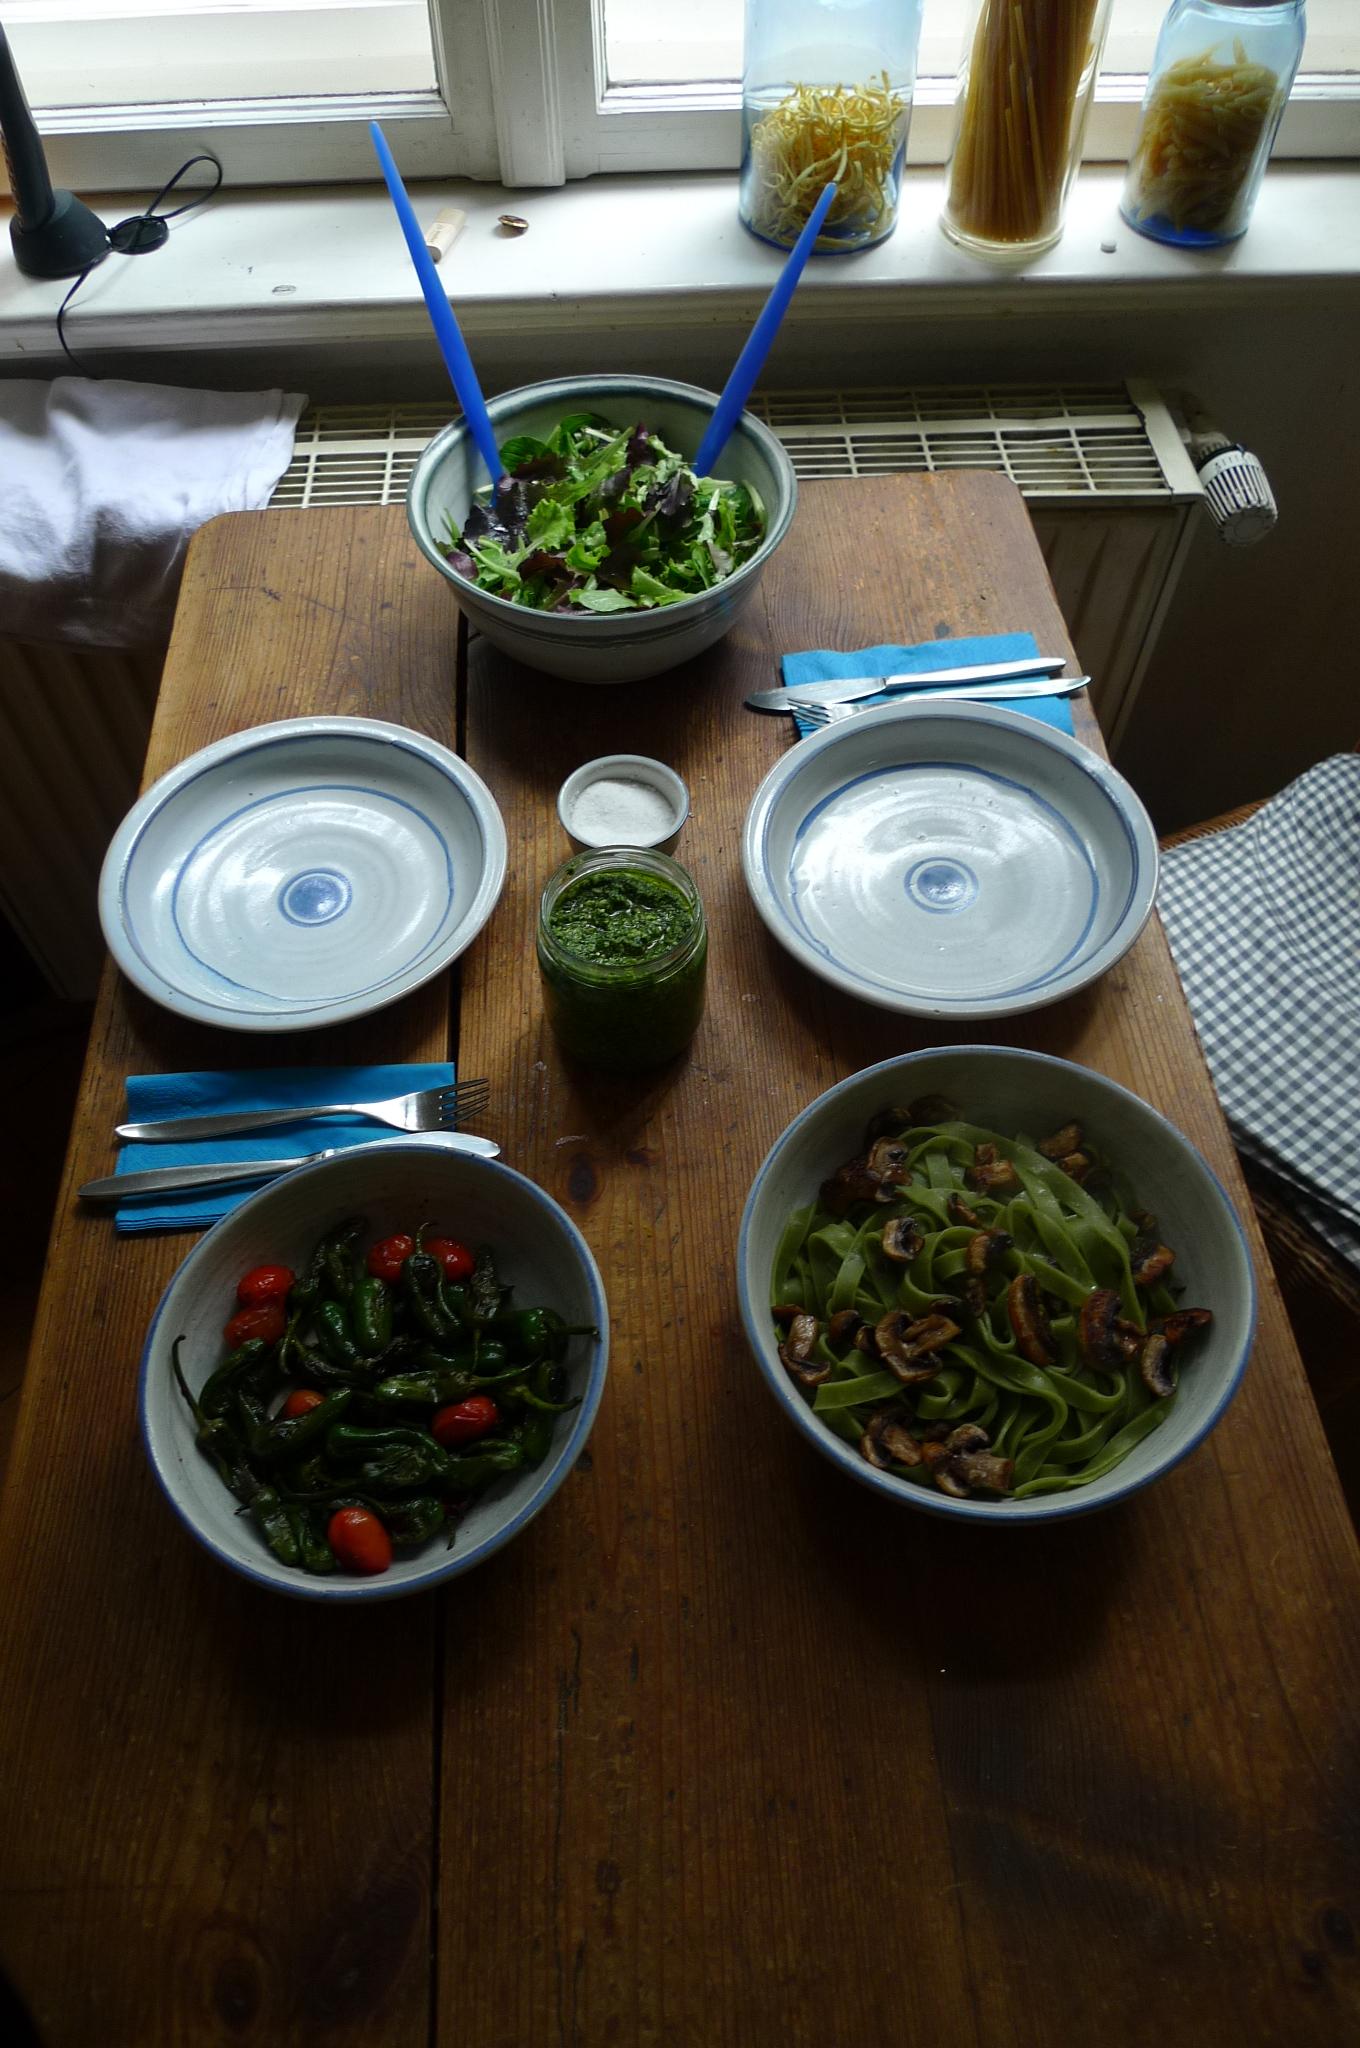 Grüne Nudeln,Ruccolapesto,Pilze,Bratpaprika,Salat-8.3.15   (8)